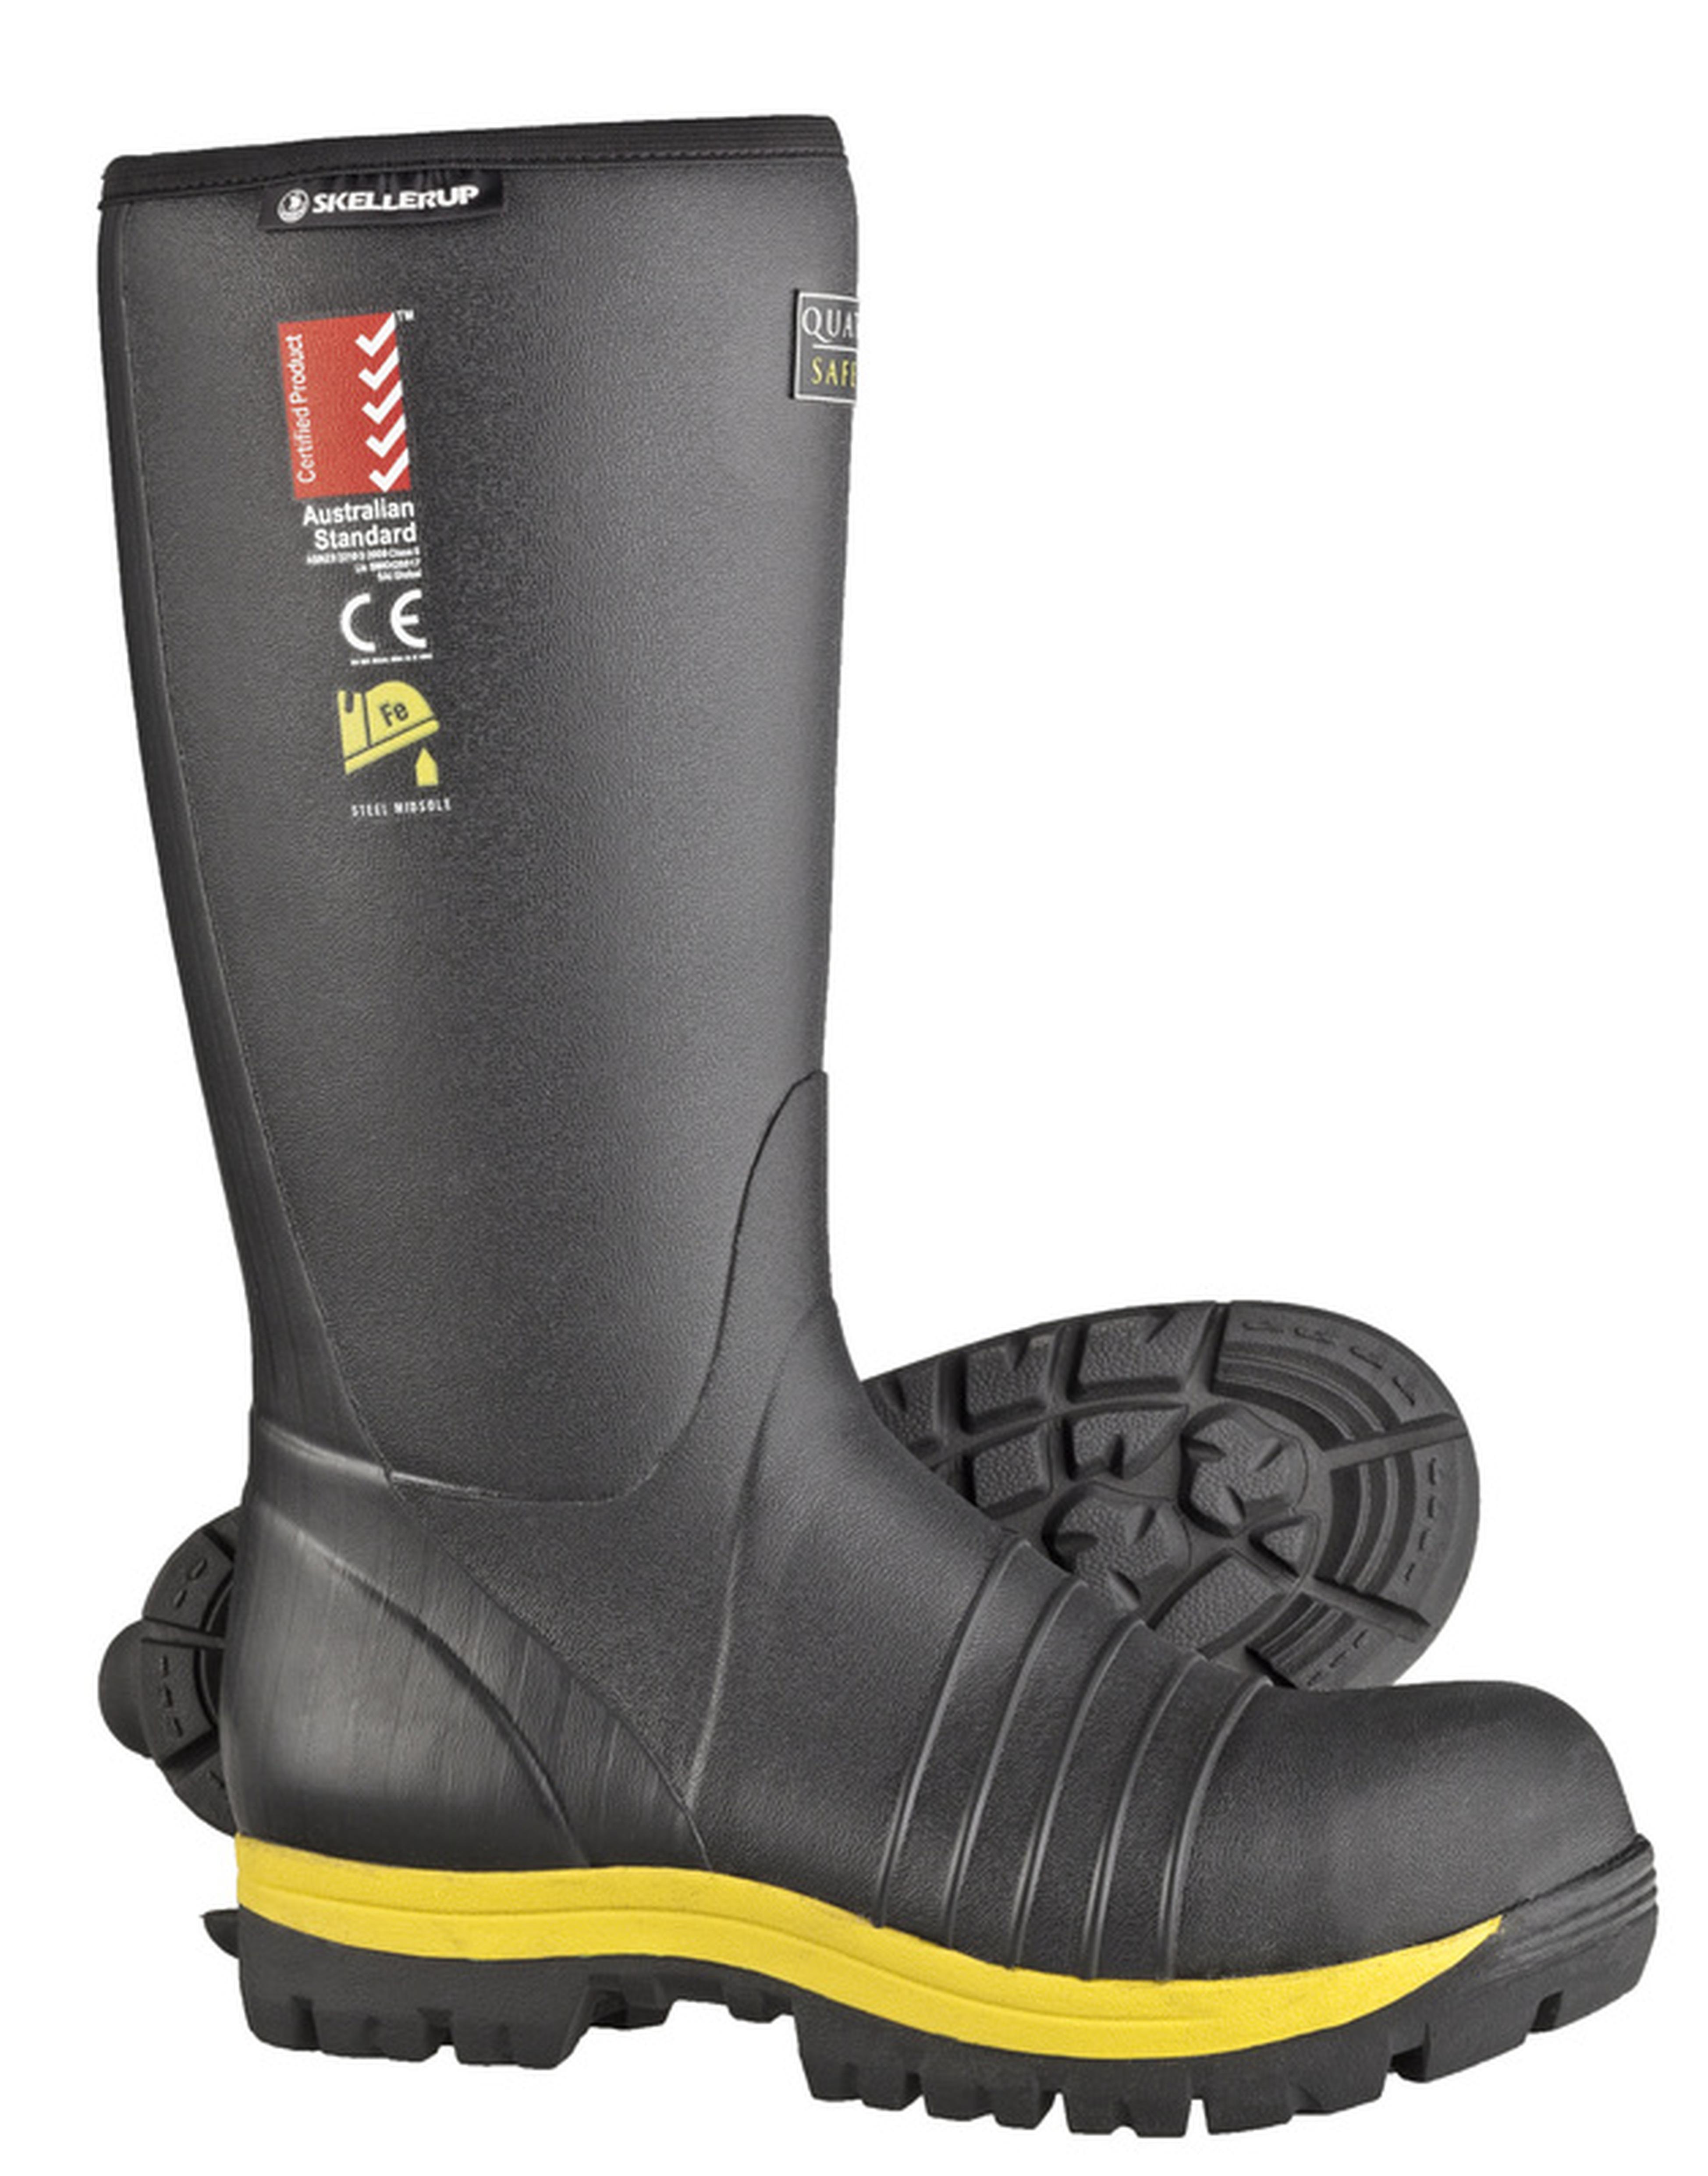 quatro 174 safety steel toe boot bag llc